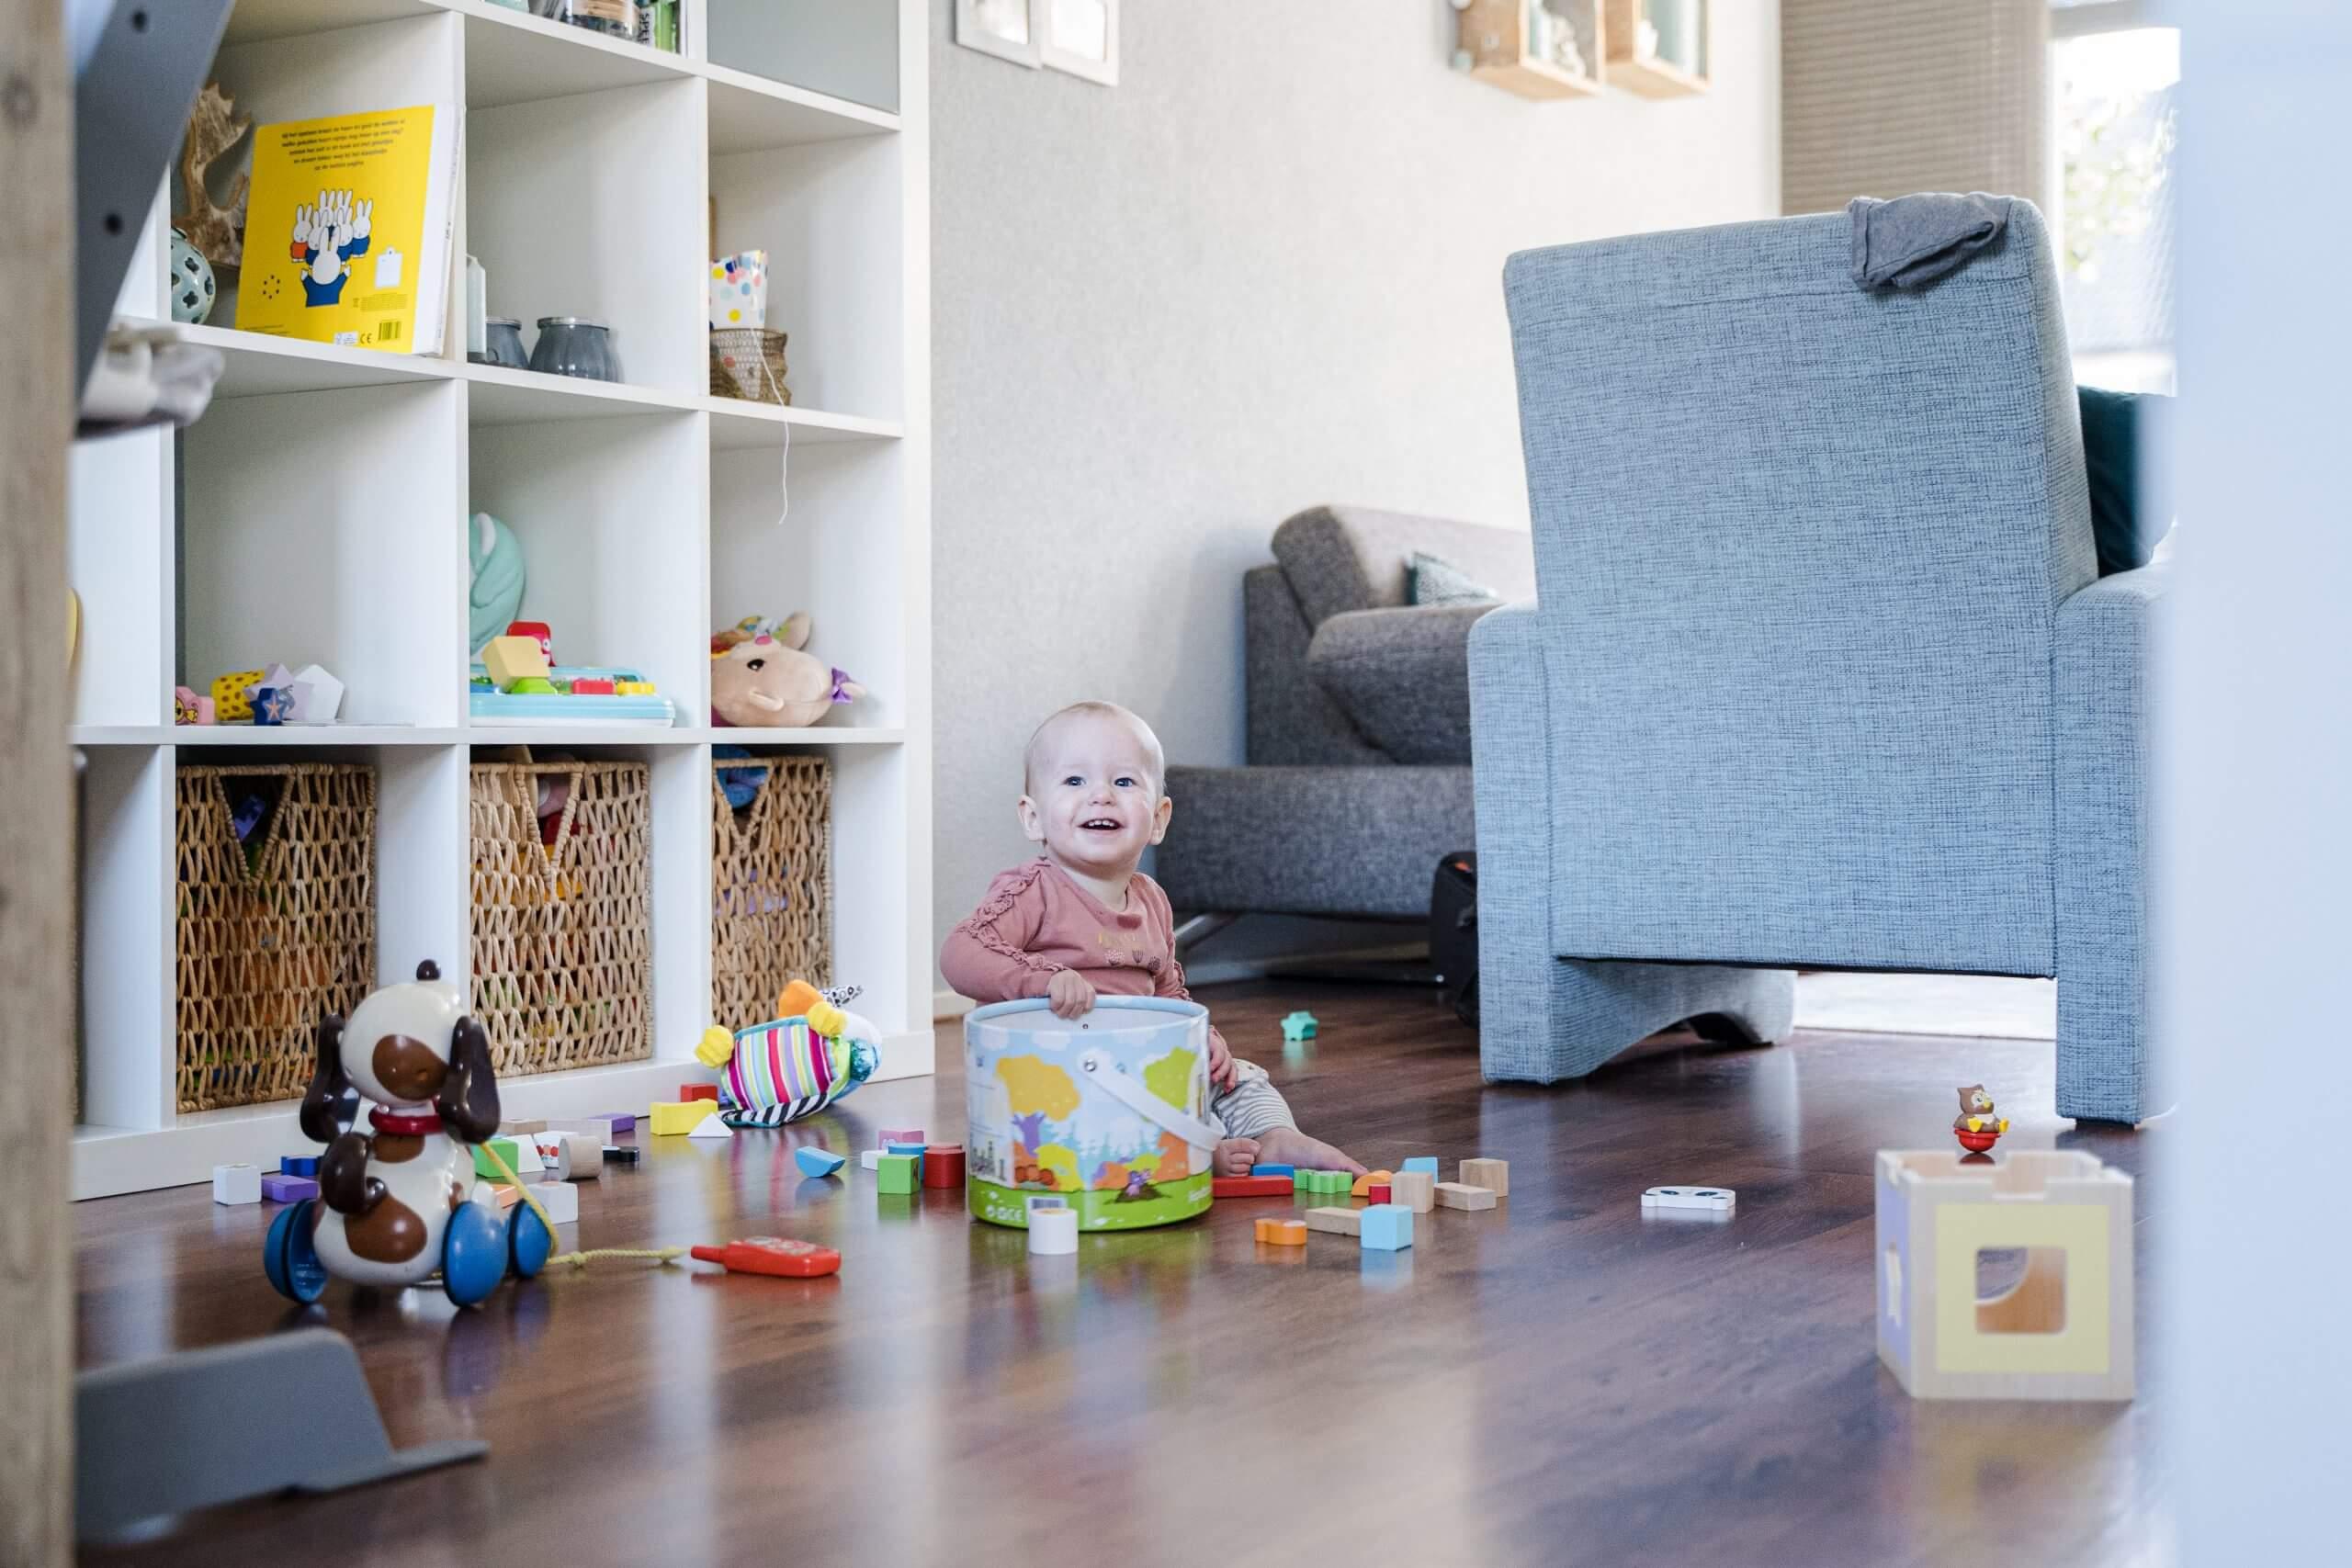 Day in the life speelgoed spelen V-tech Ikea kast